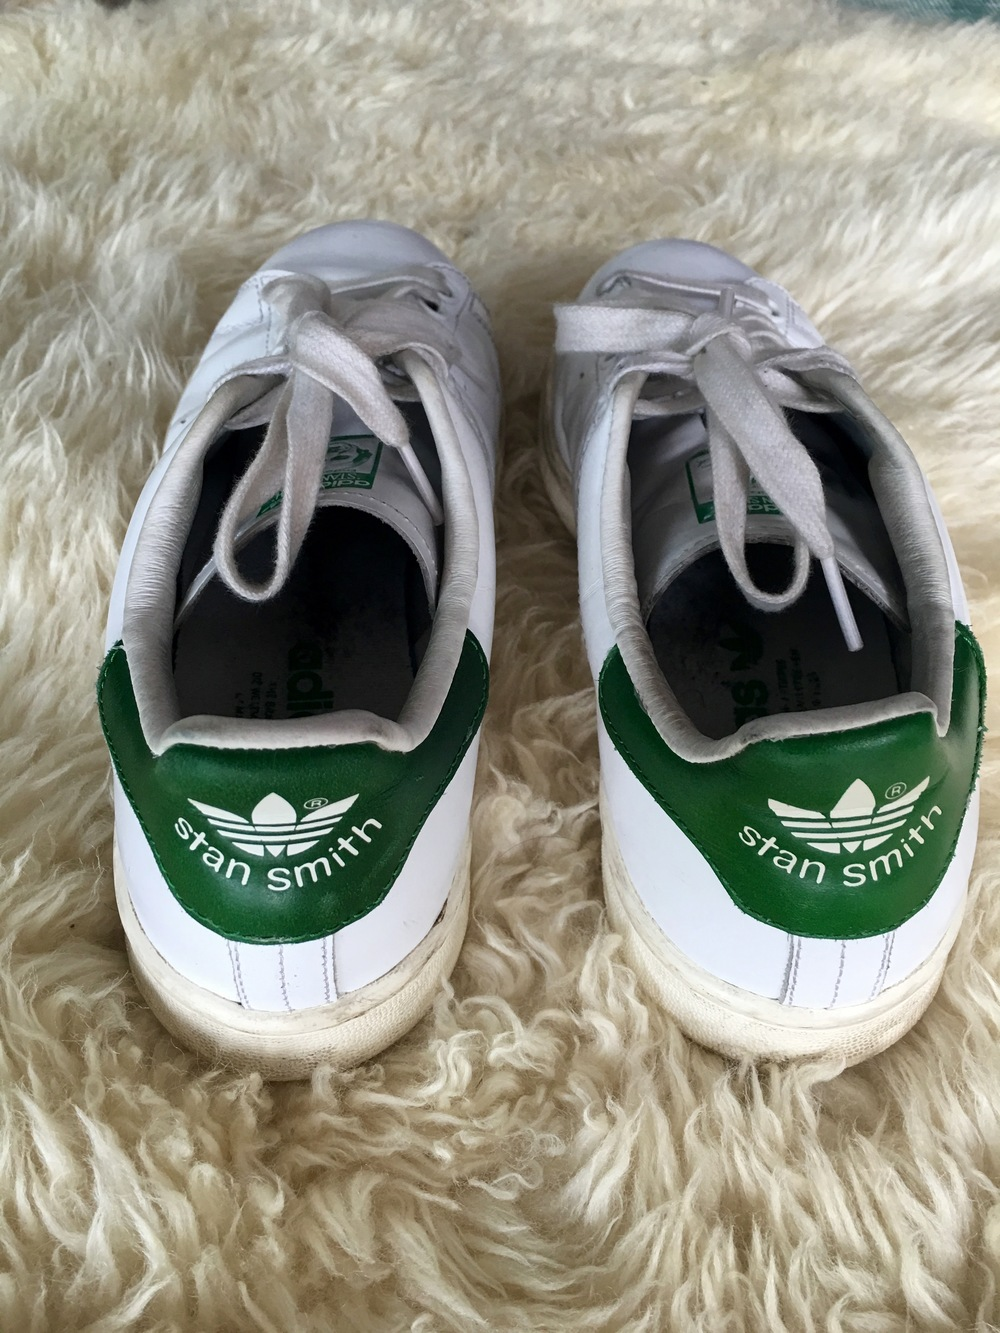 My beloved Adidas...